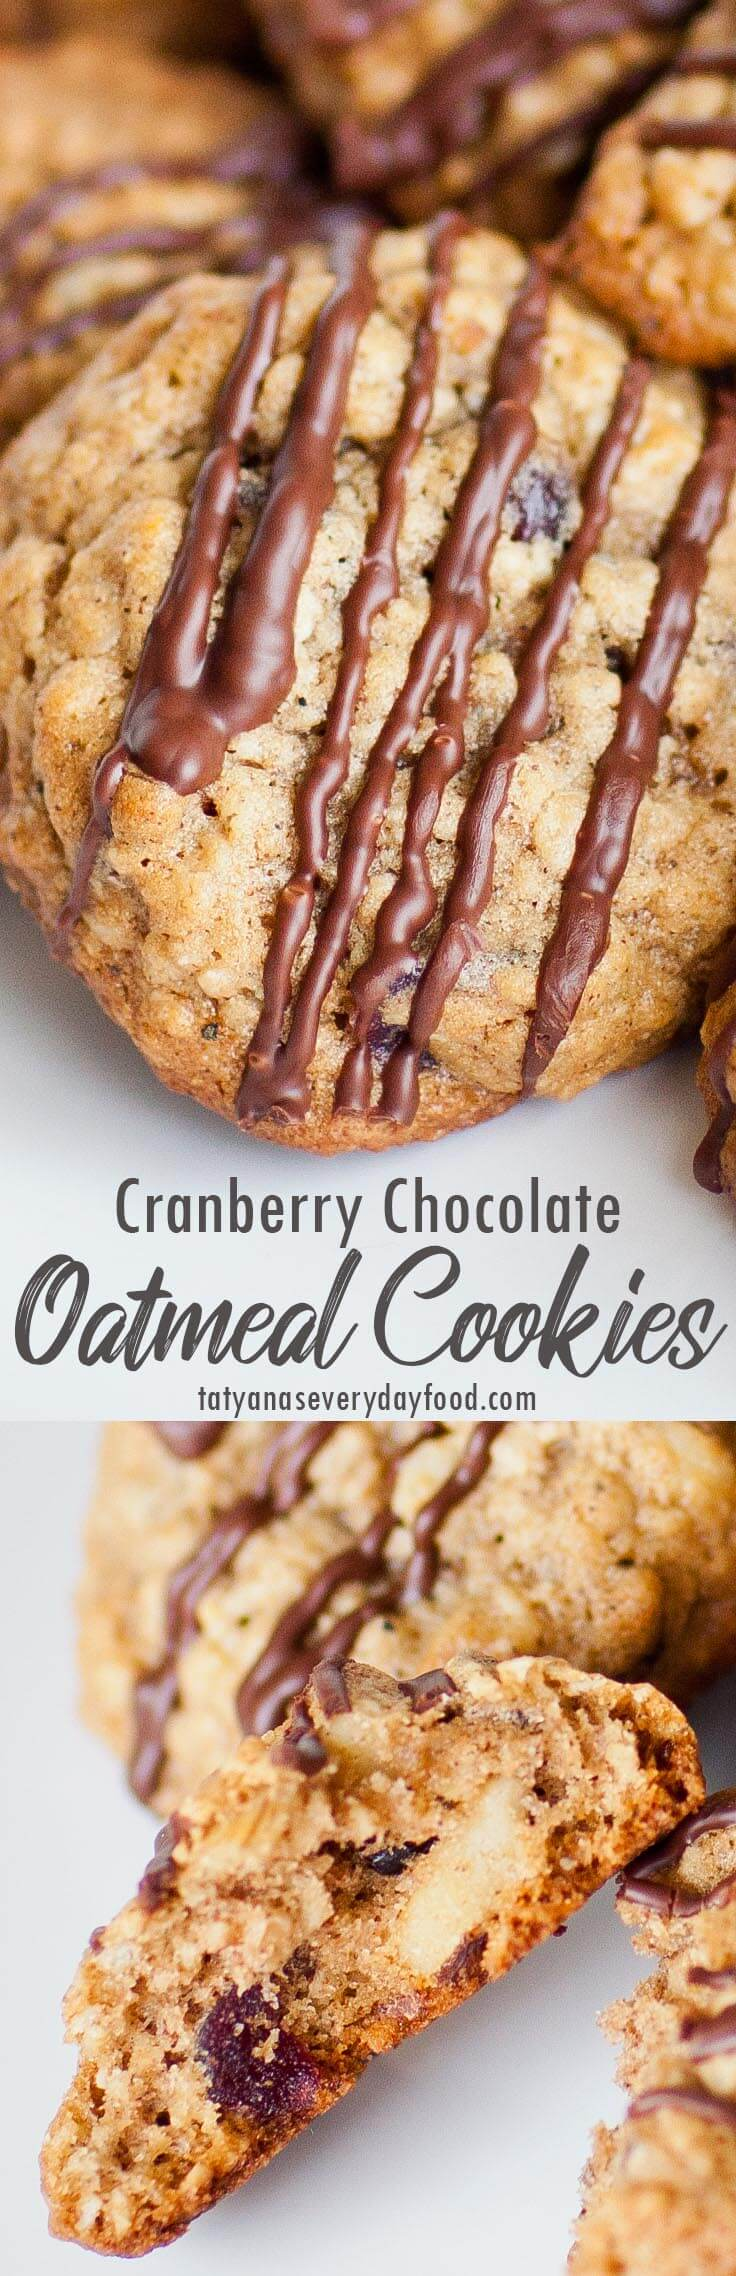 Cranberry Chocolate Oatmeal Cookies recipe